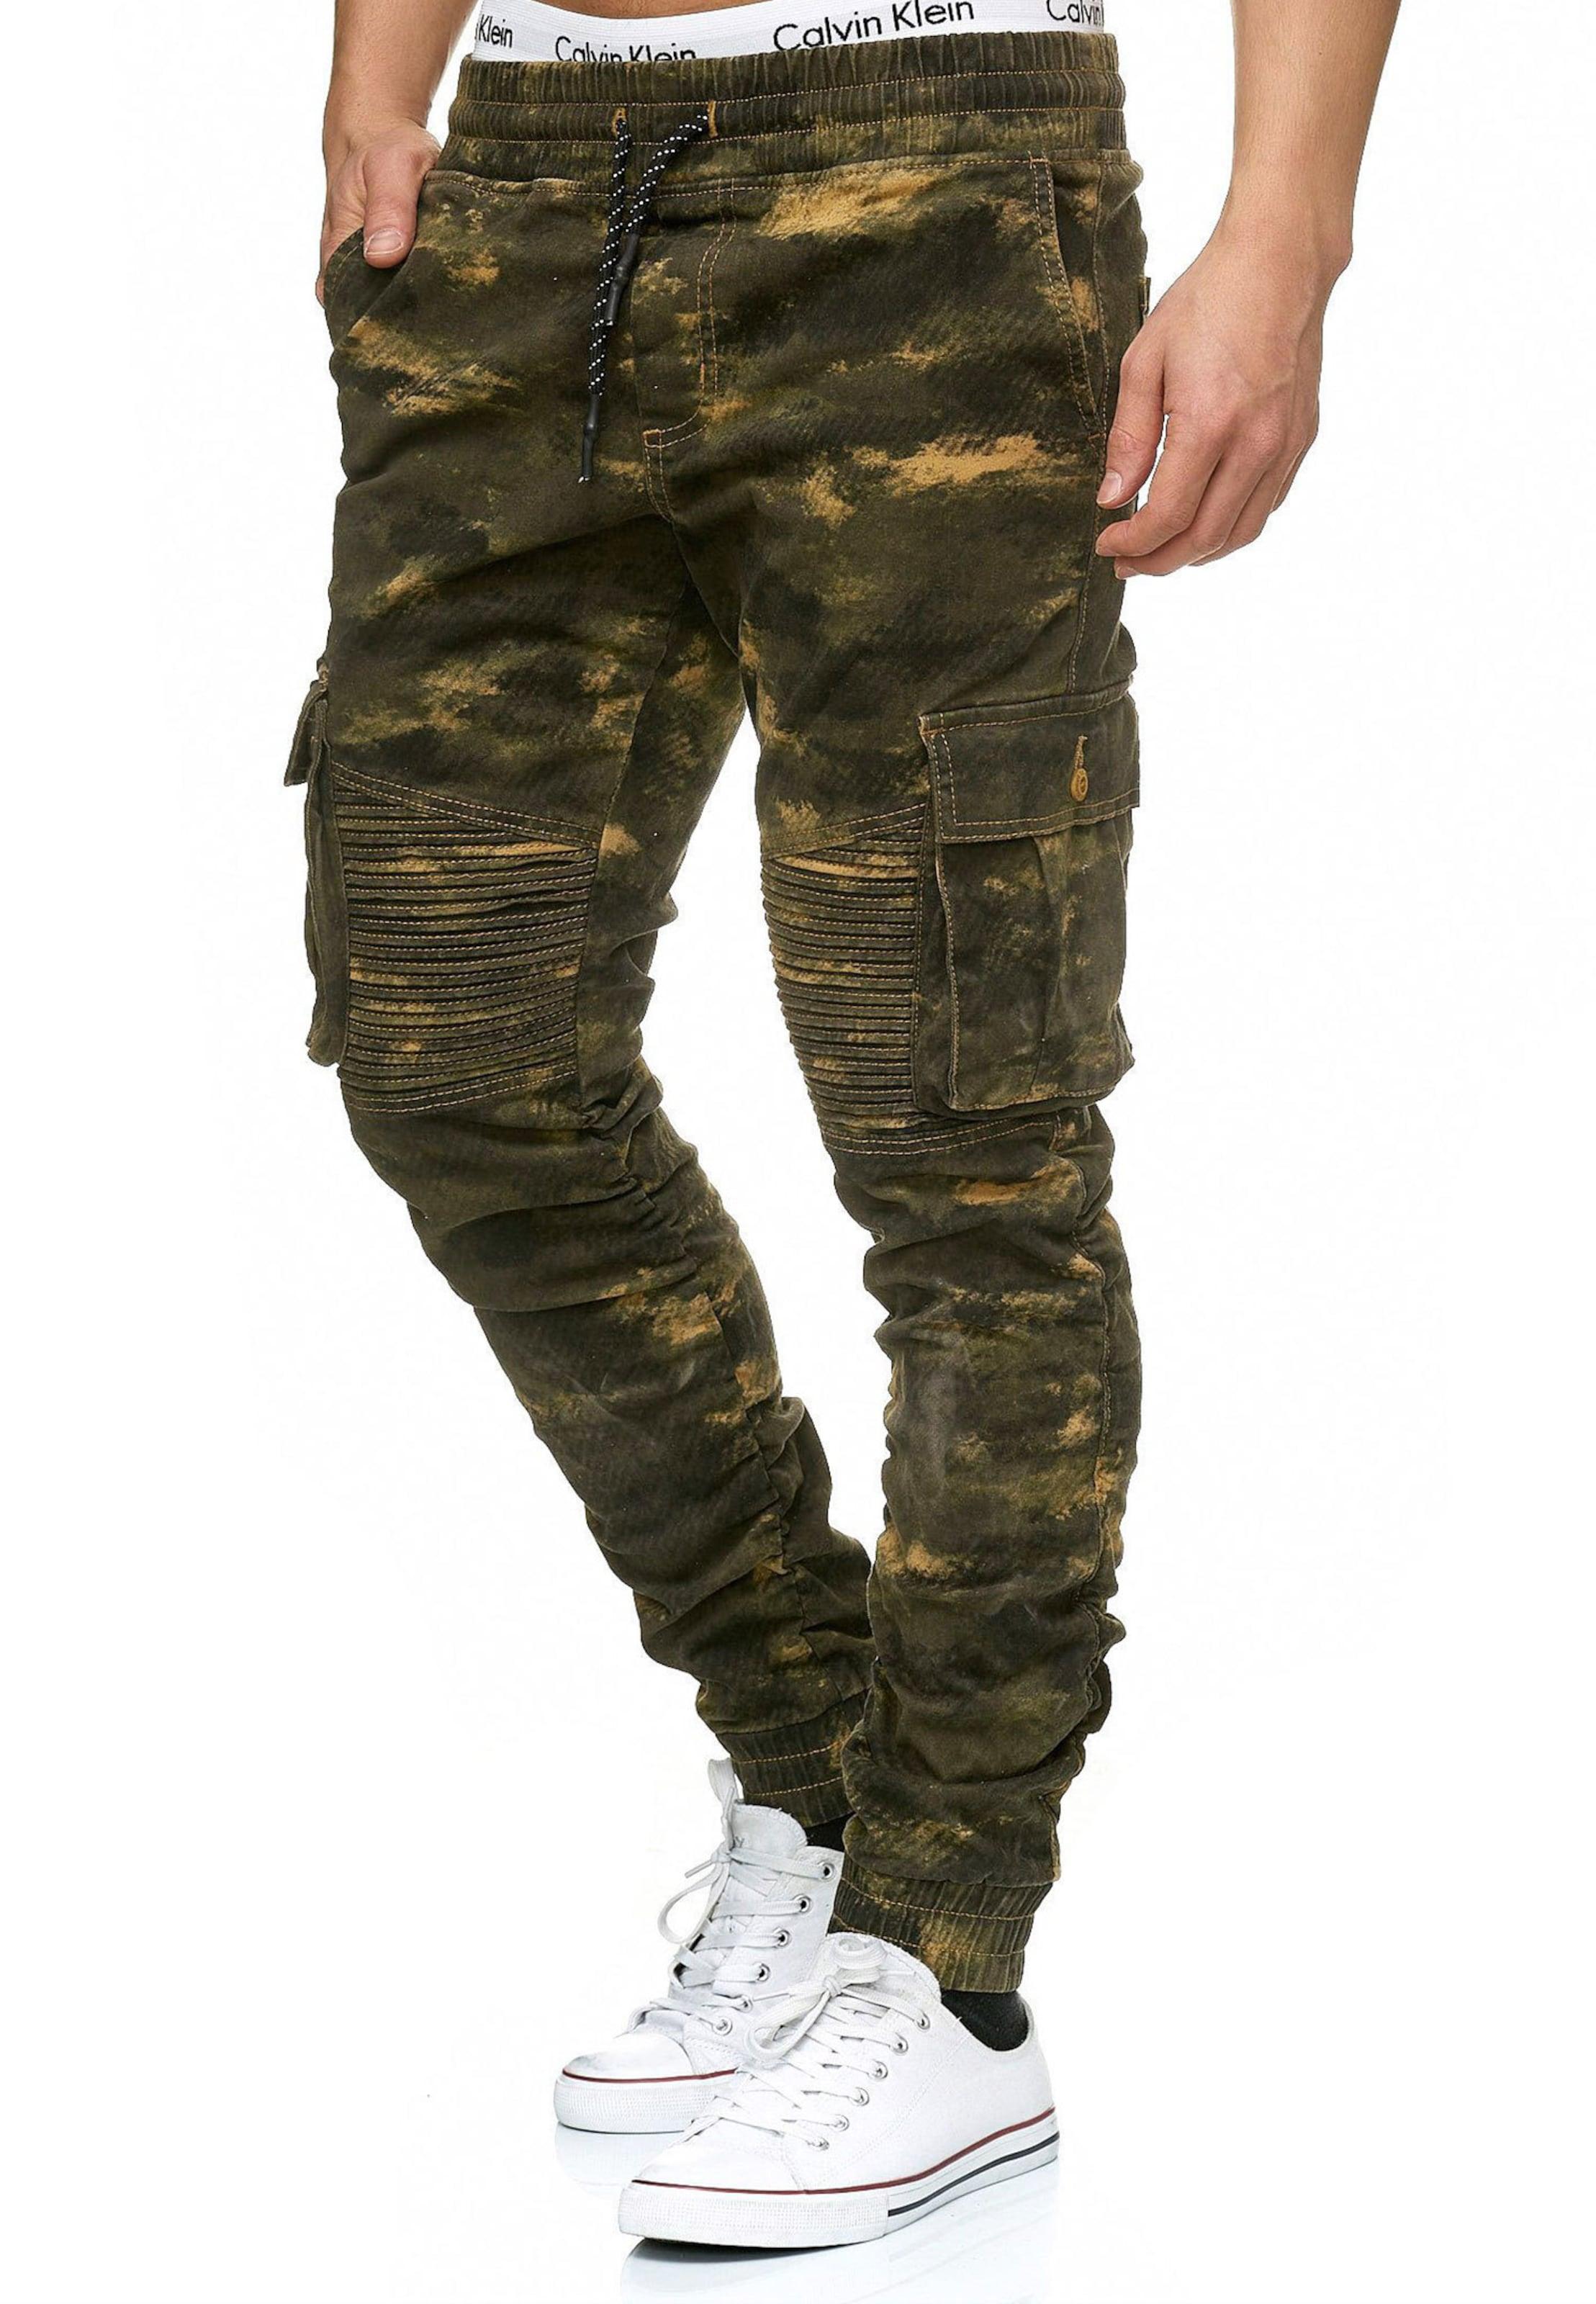 FoncéKaki Jaune Cargo Pantalon En Jeans Indicode 'louis' Vert IeH29YbWED